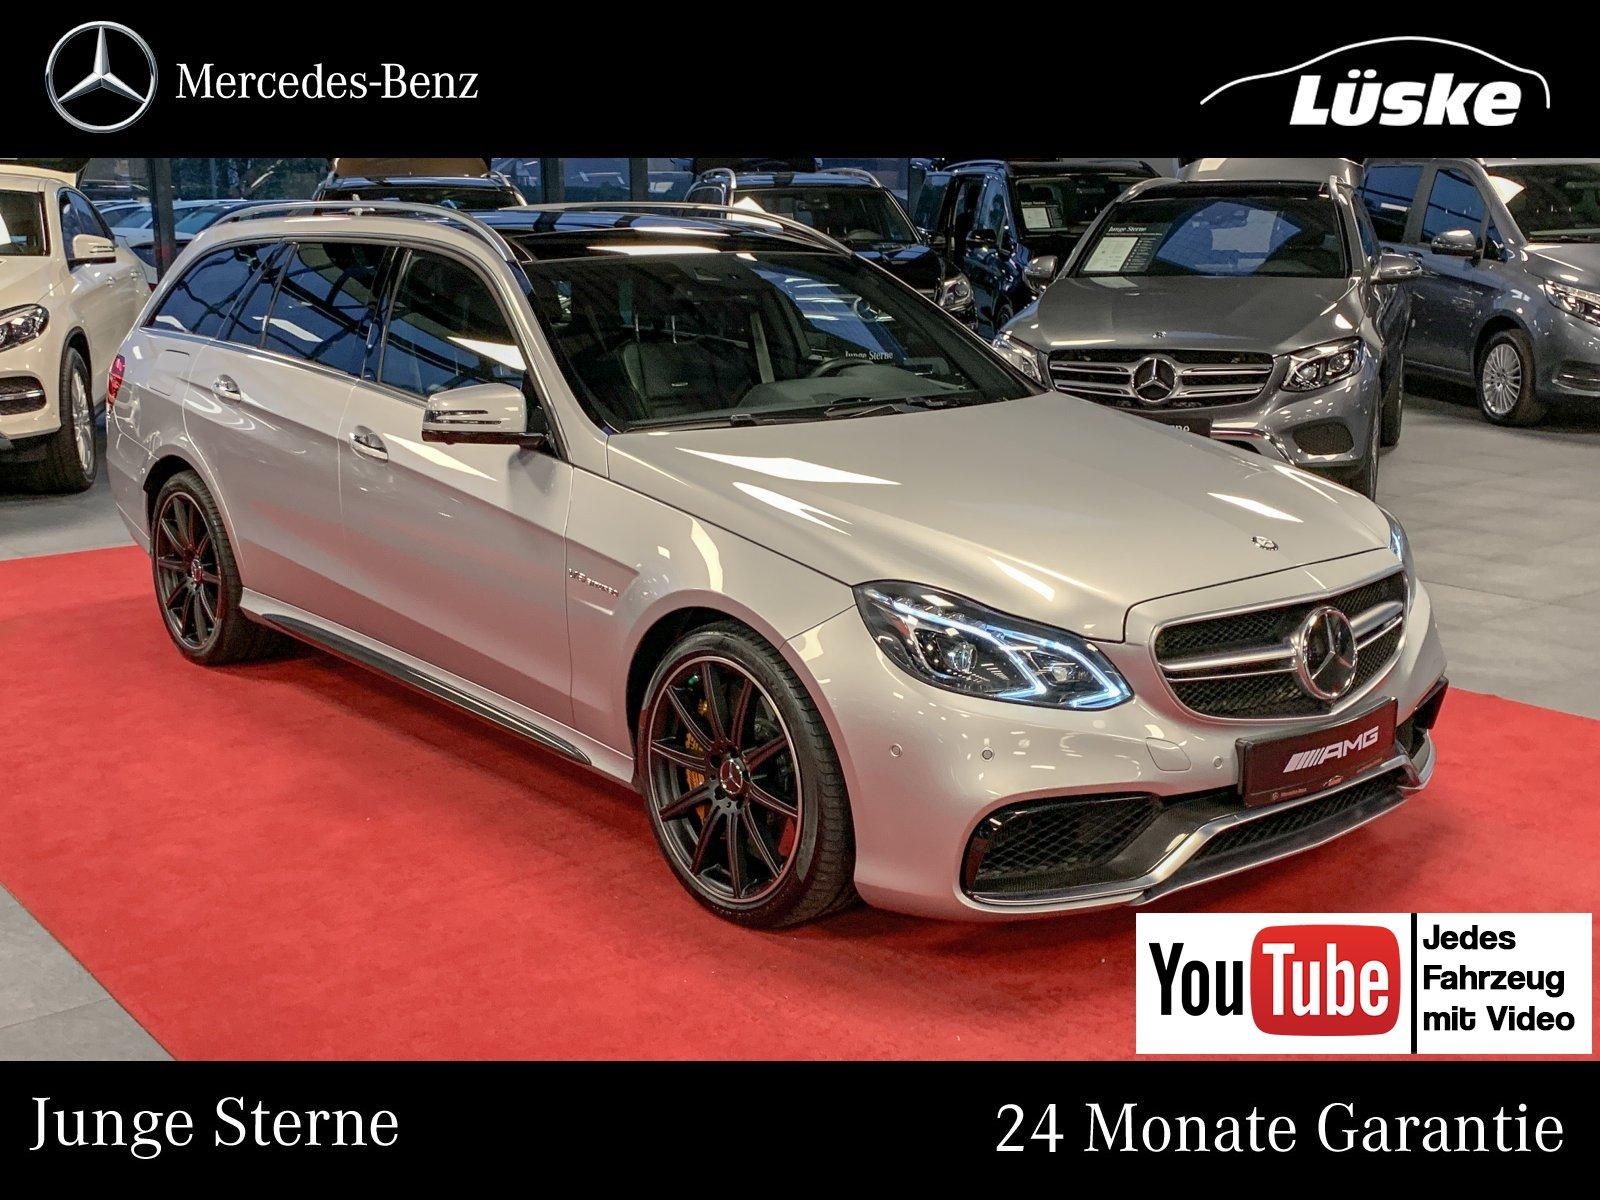 Mercedes-Benz E 63 AMG S 4M T Keramik DriverŽs Package 160.281, Jahr 2017, Benzin